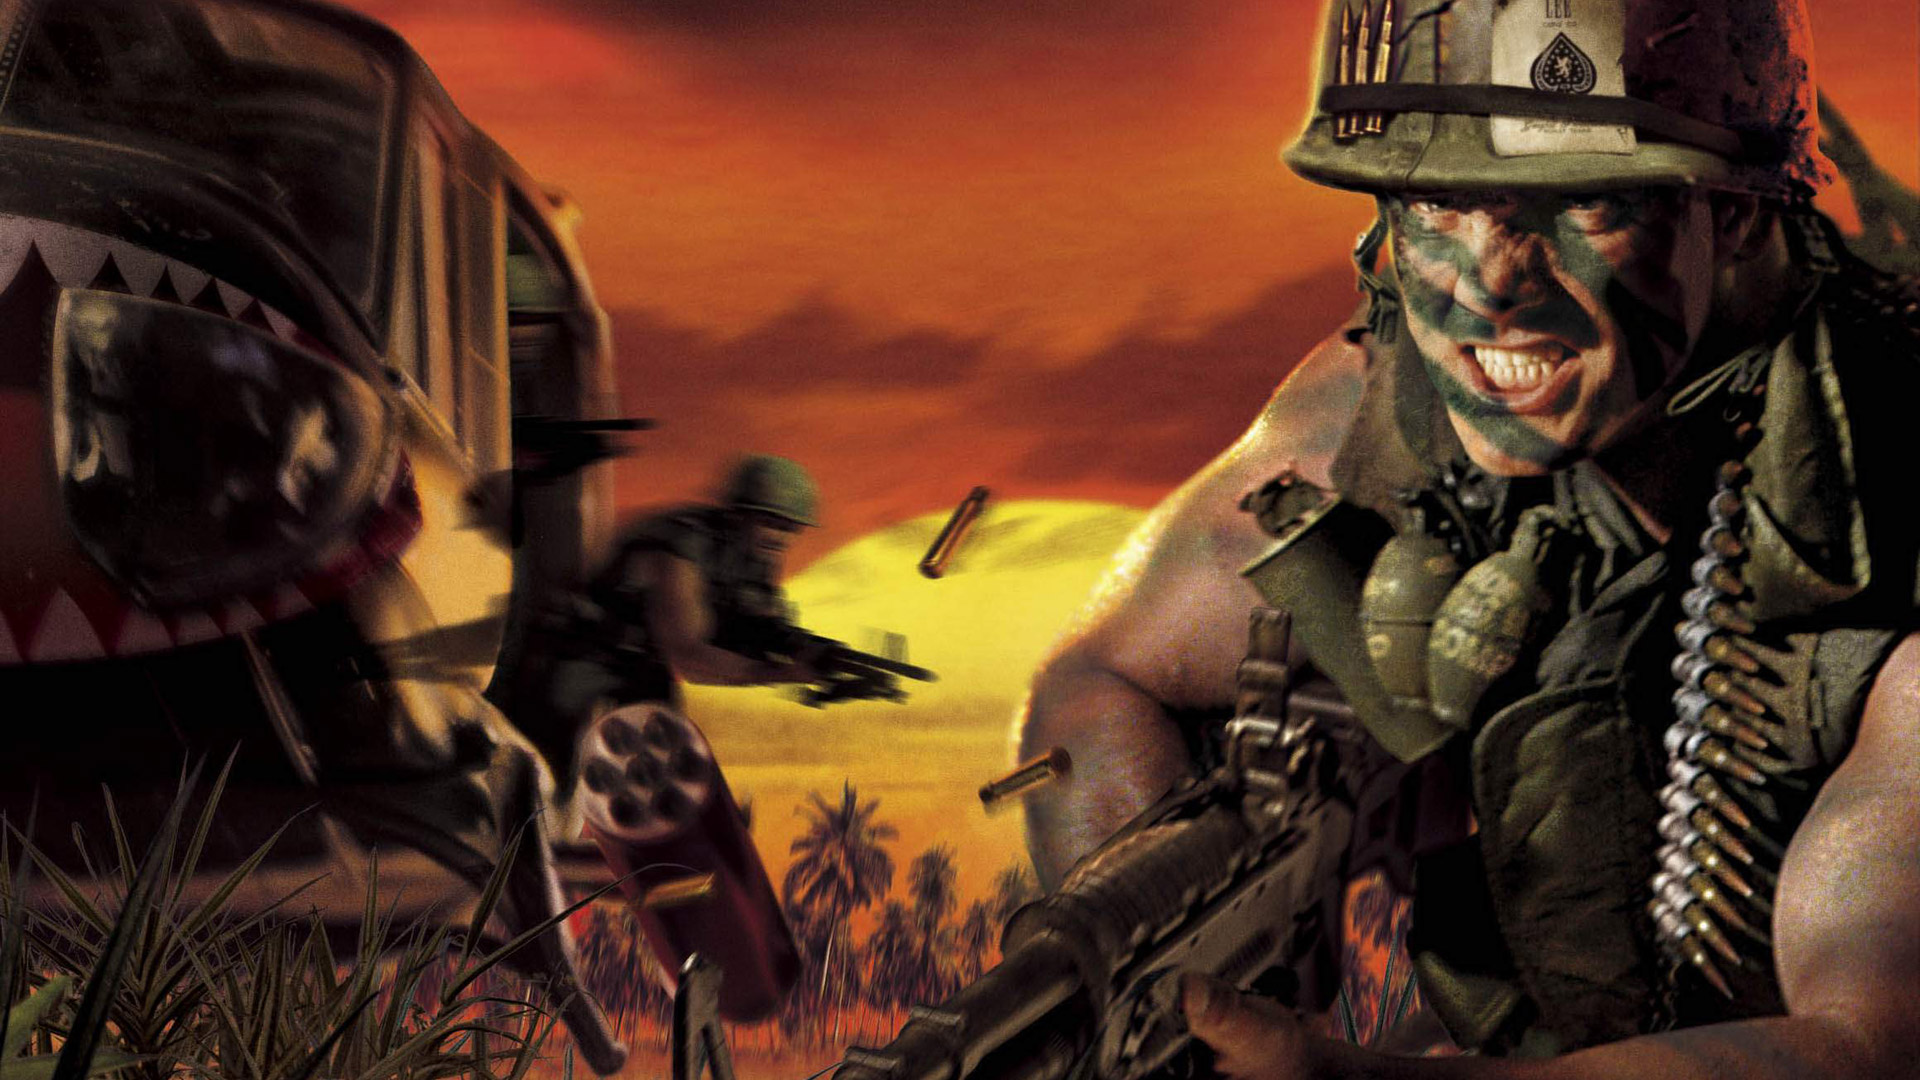 Battlefield: Vietnam Wallpaper in 1920x1080